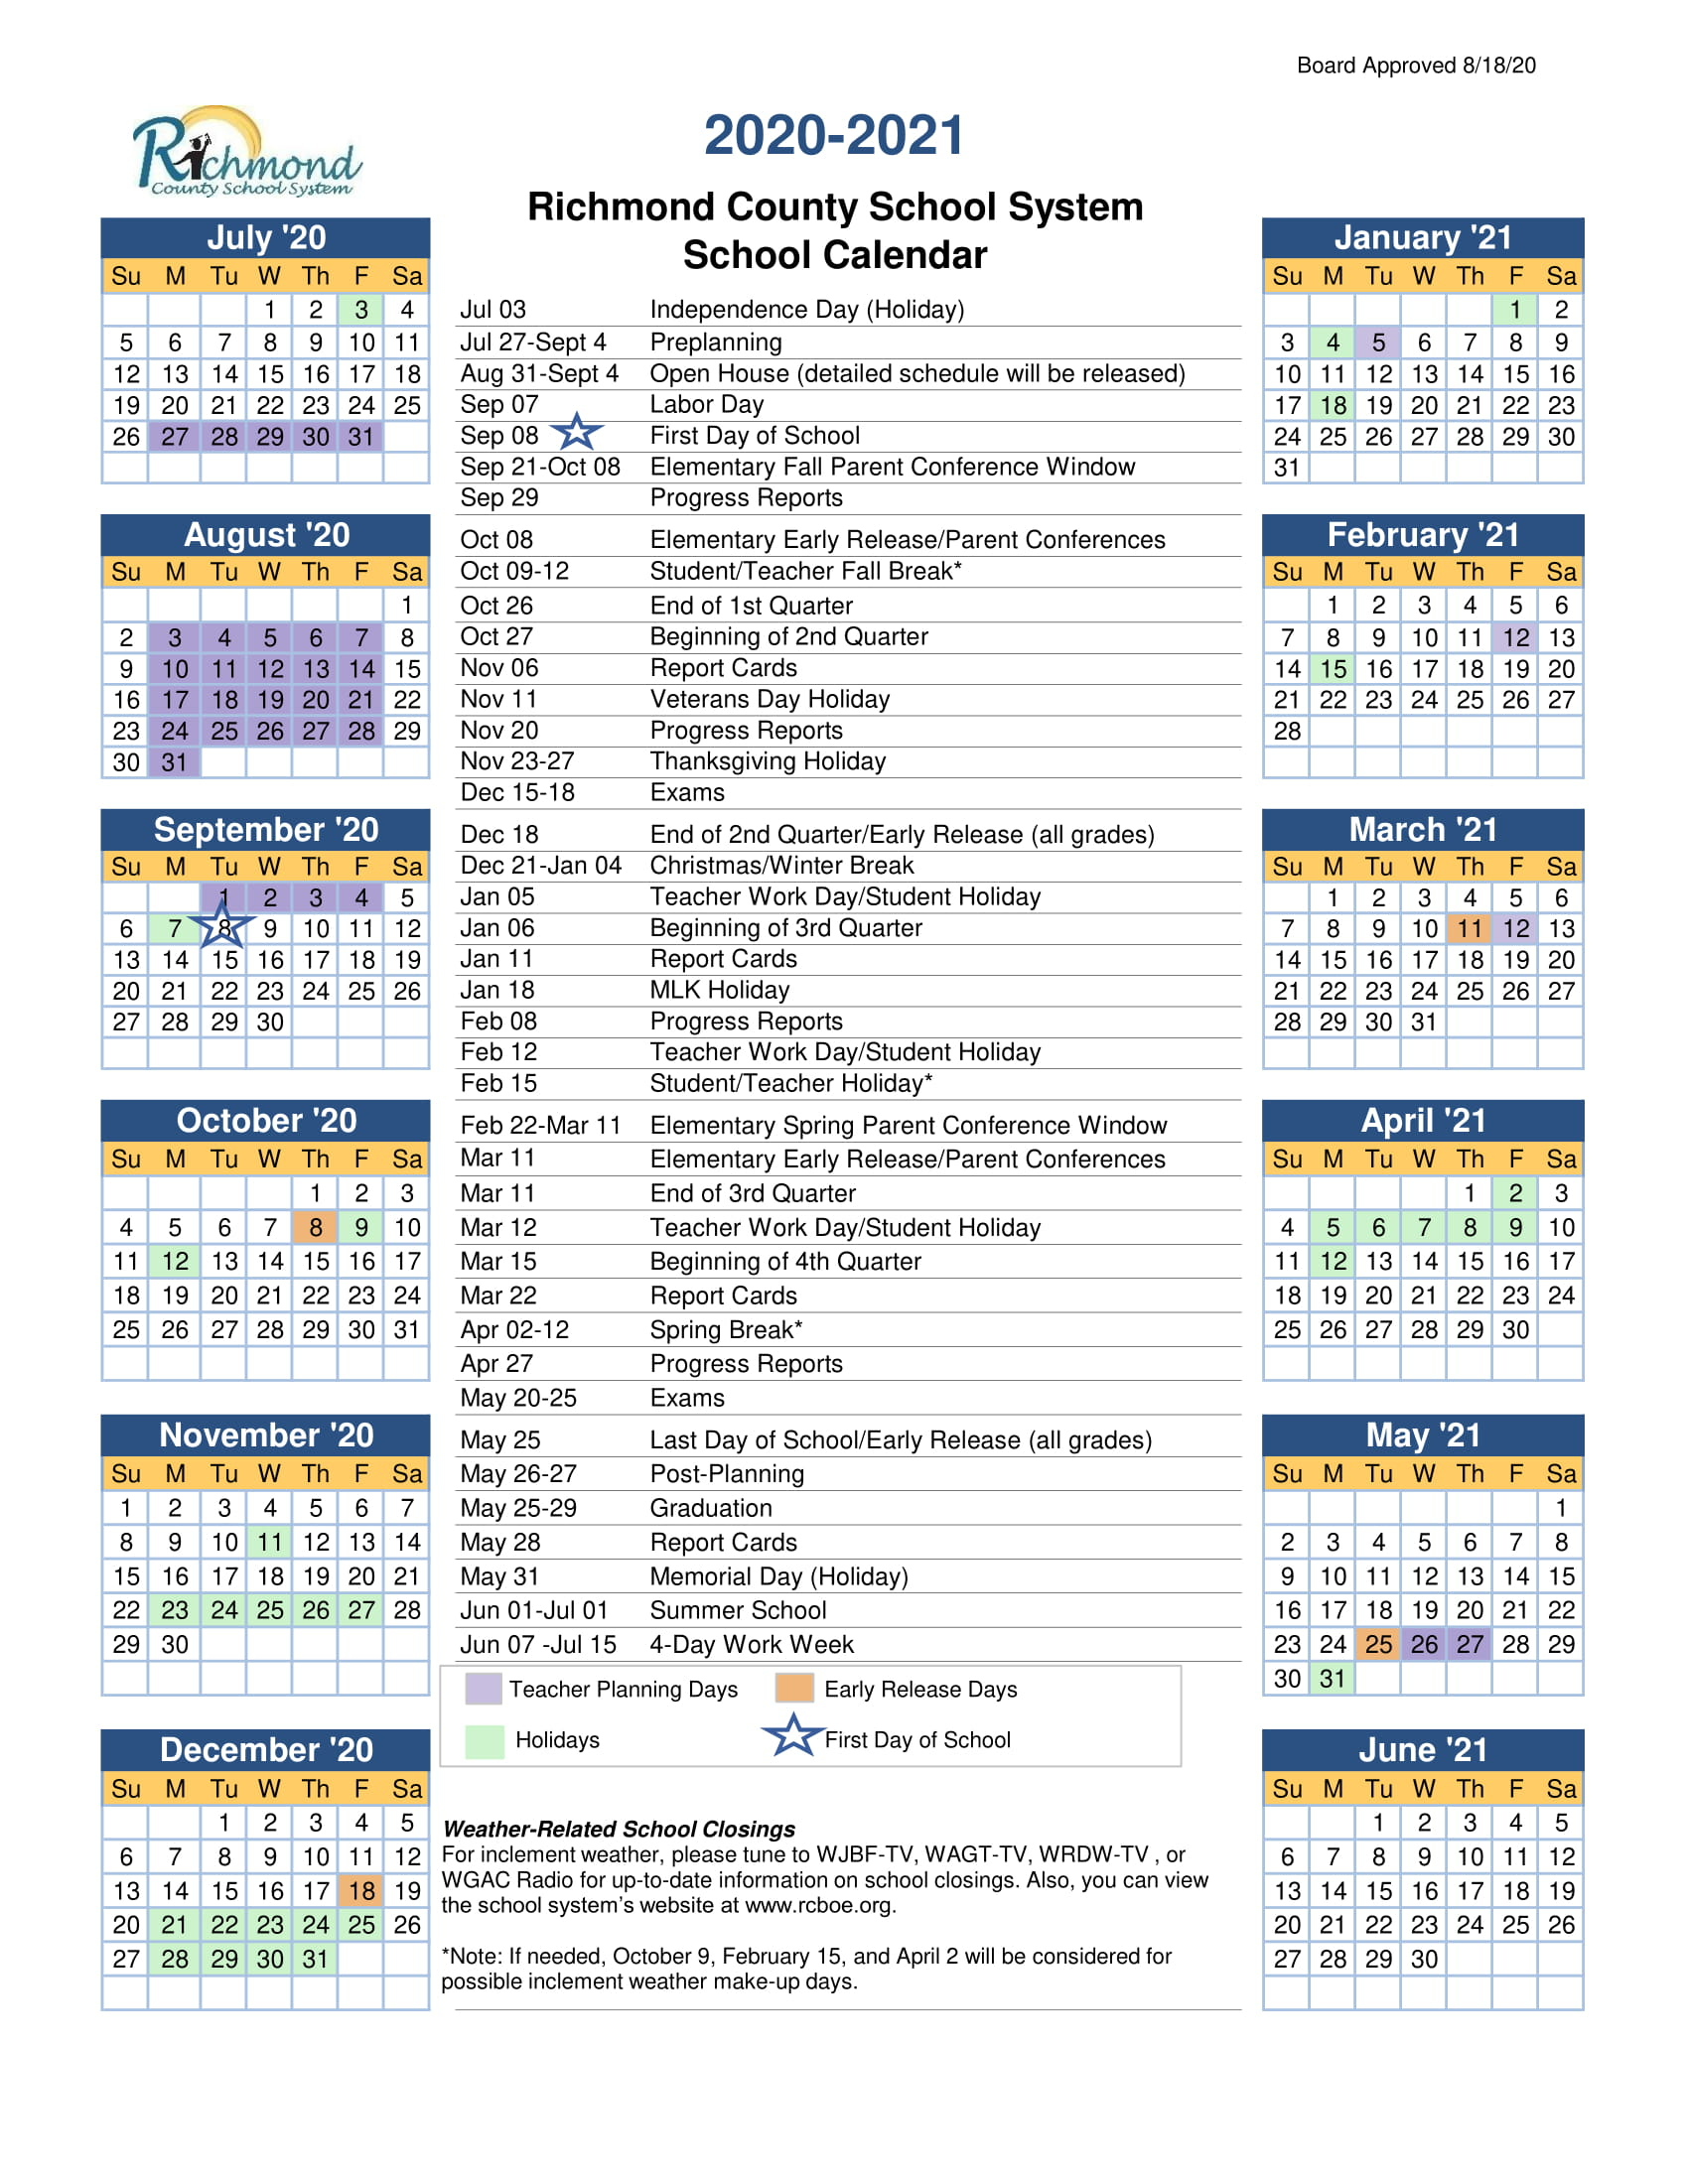 Guidance Santriece Copeland / Staff Homepage With Regard To Richmond Countyboard Of Education 2021 Calendar